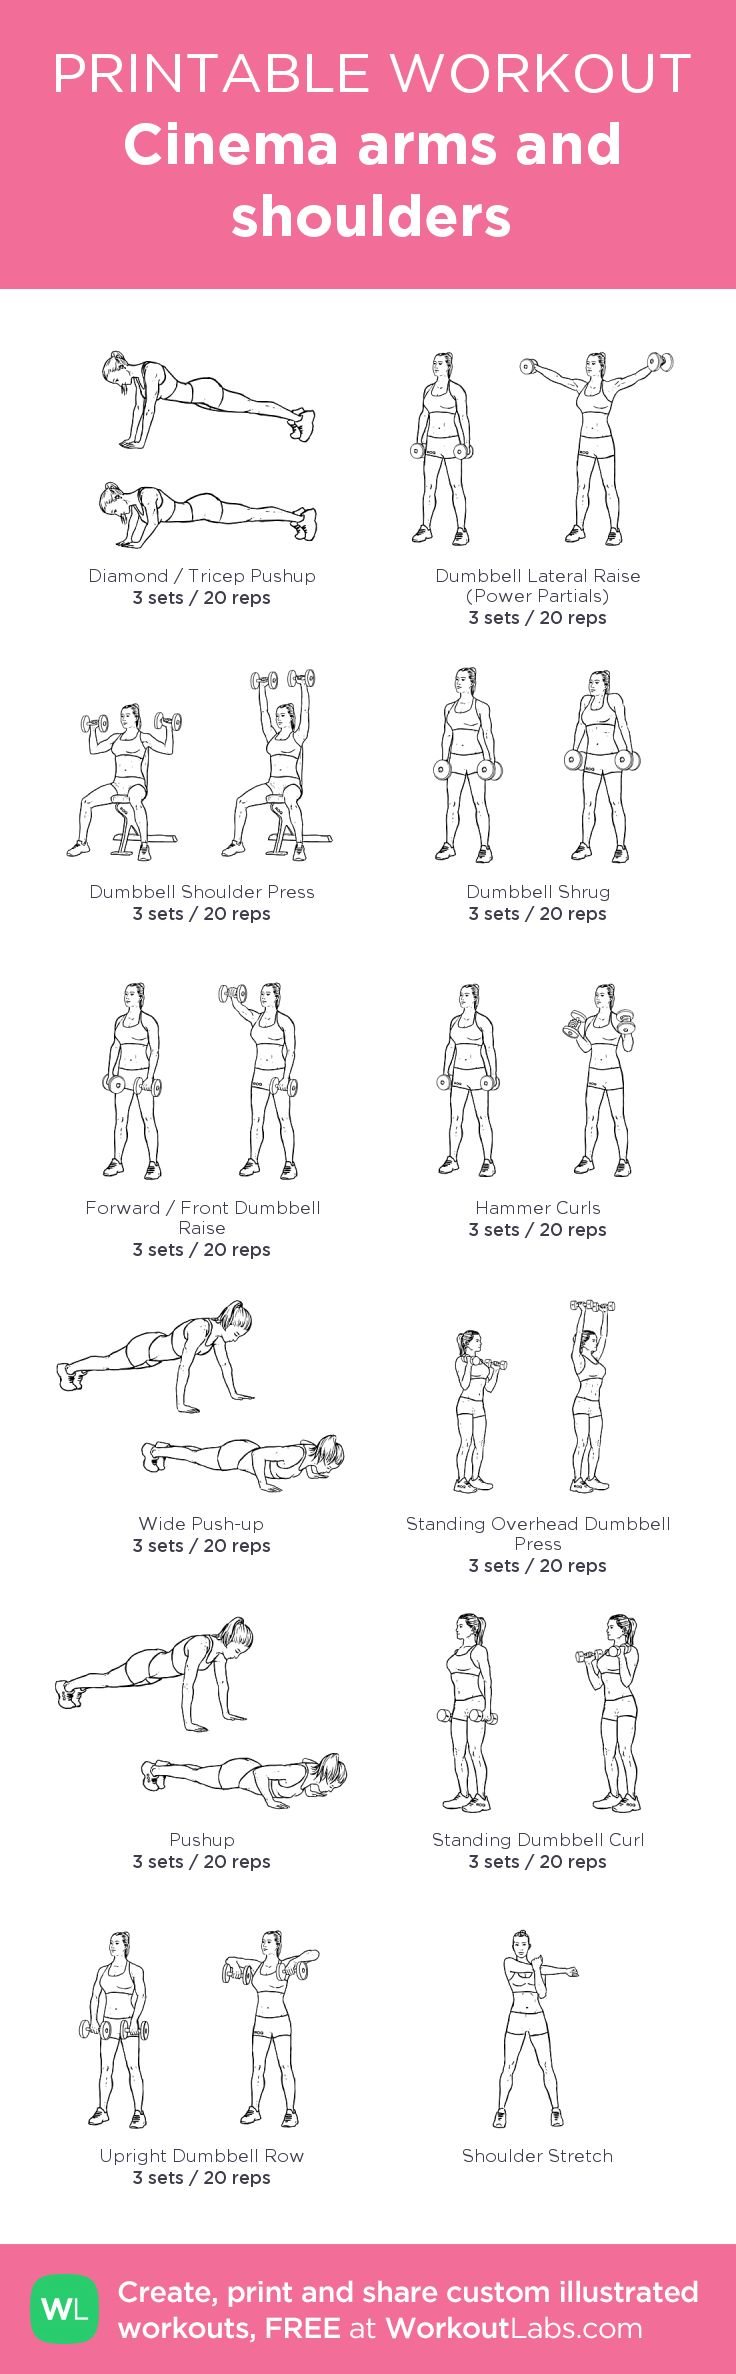 Cinema arms and shoulders:my custom printable workout by @WorkoutLabs #workoutlabs #customworkout